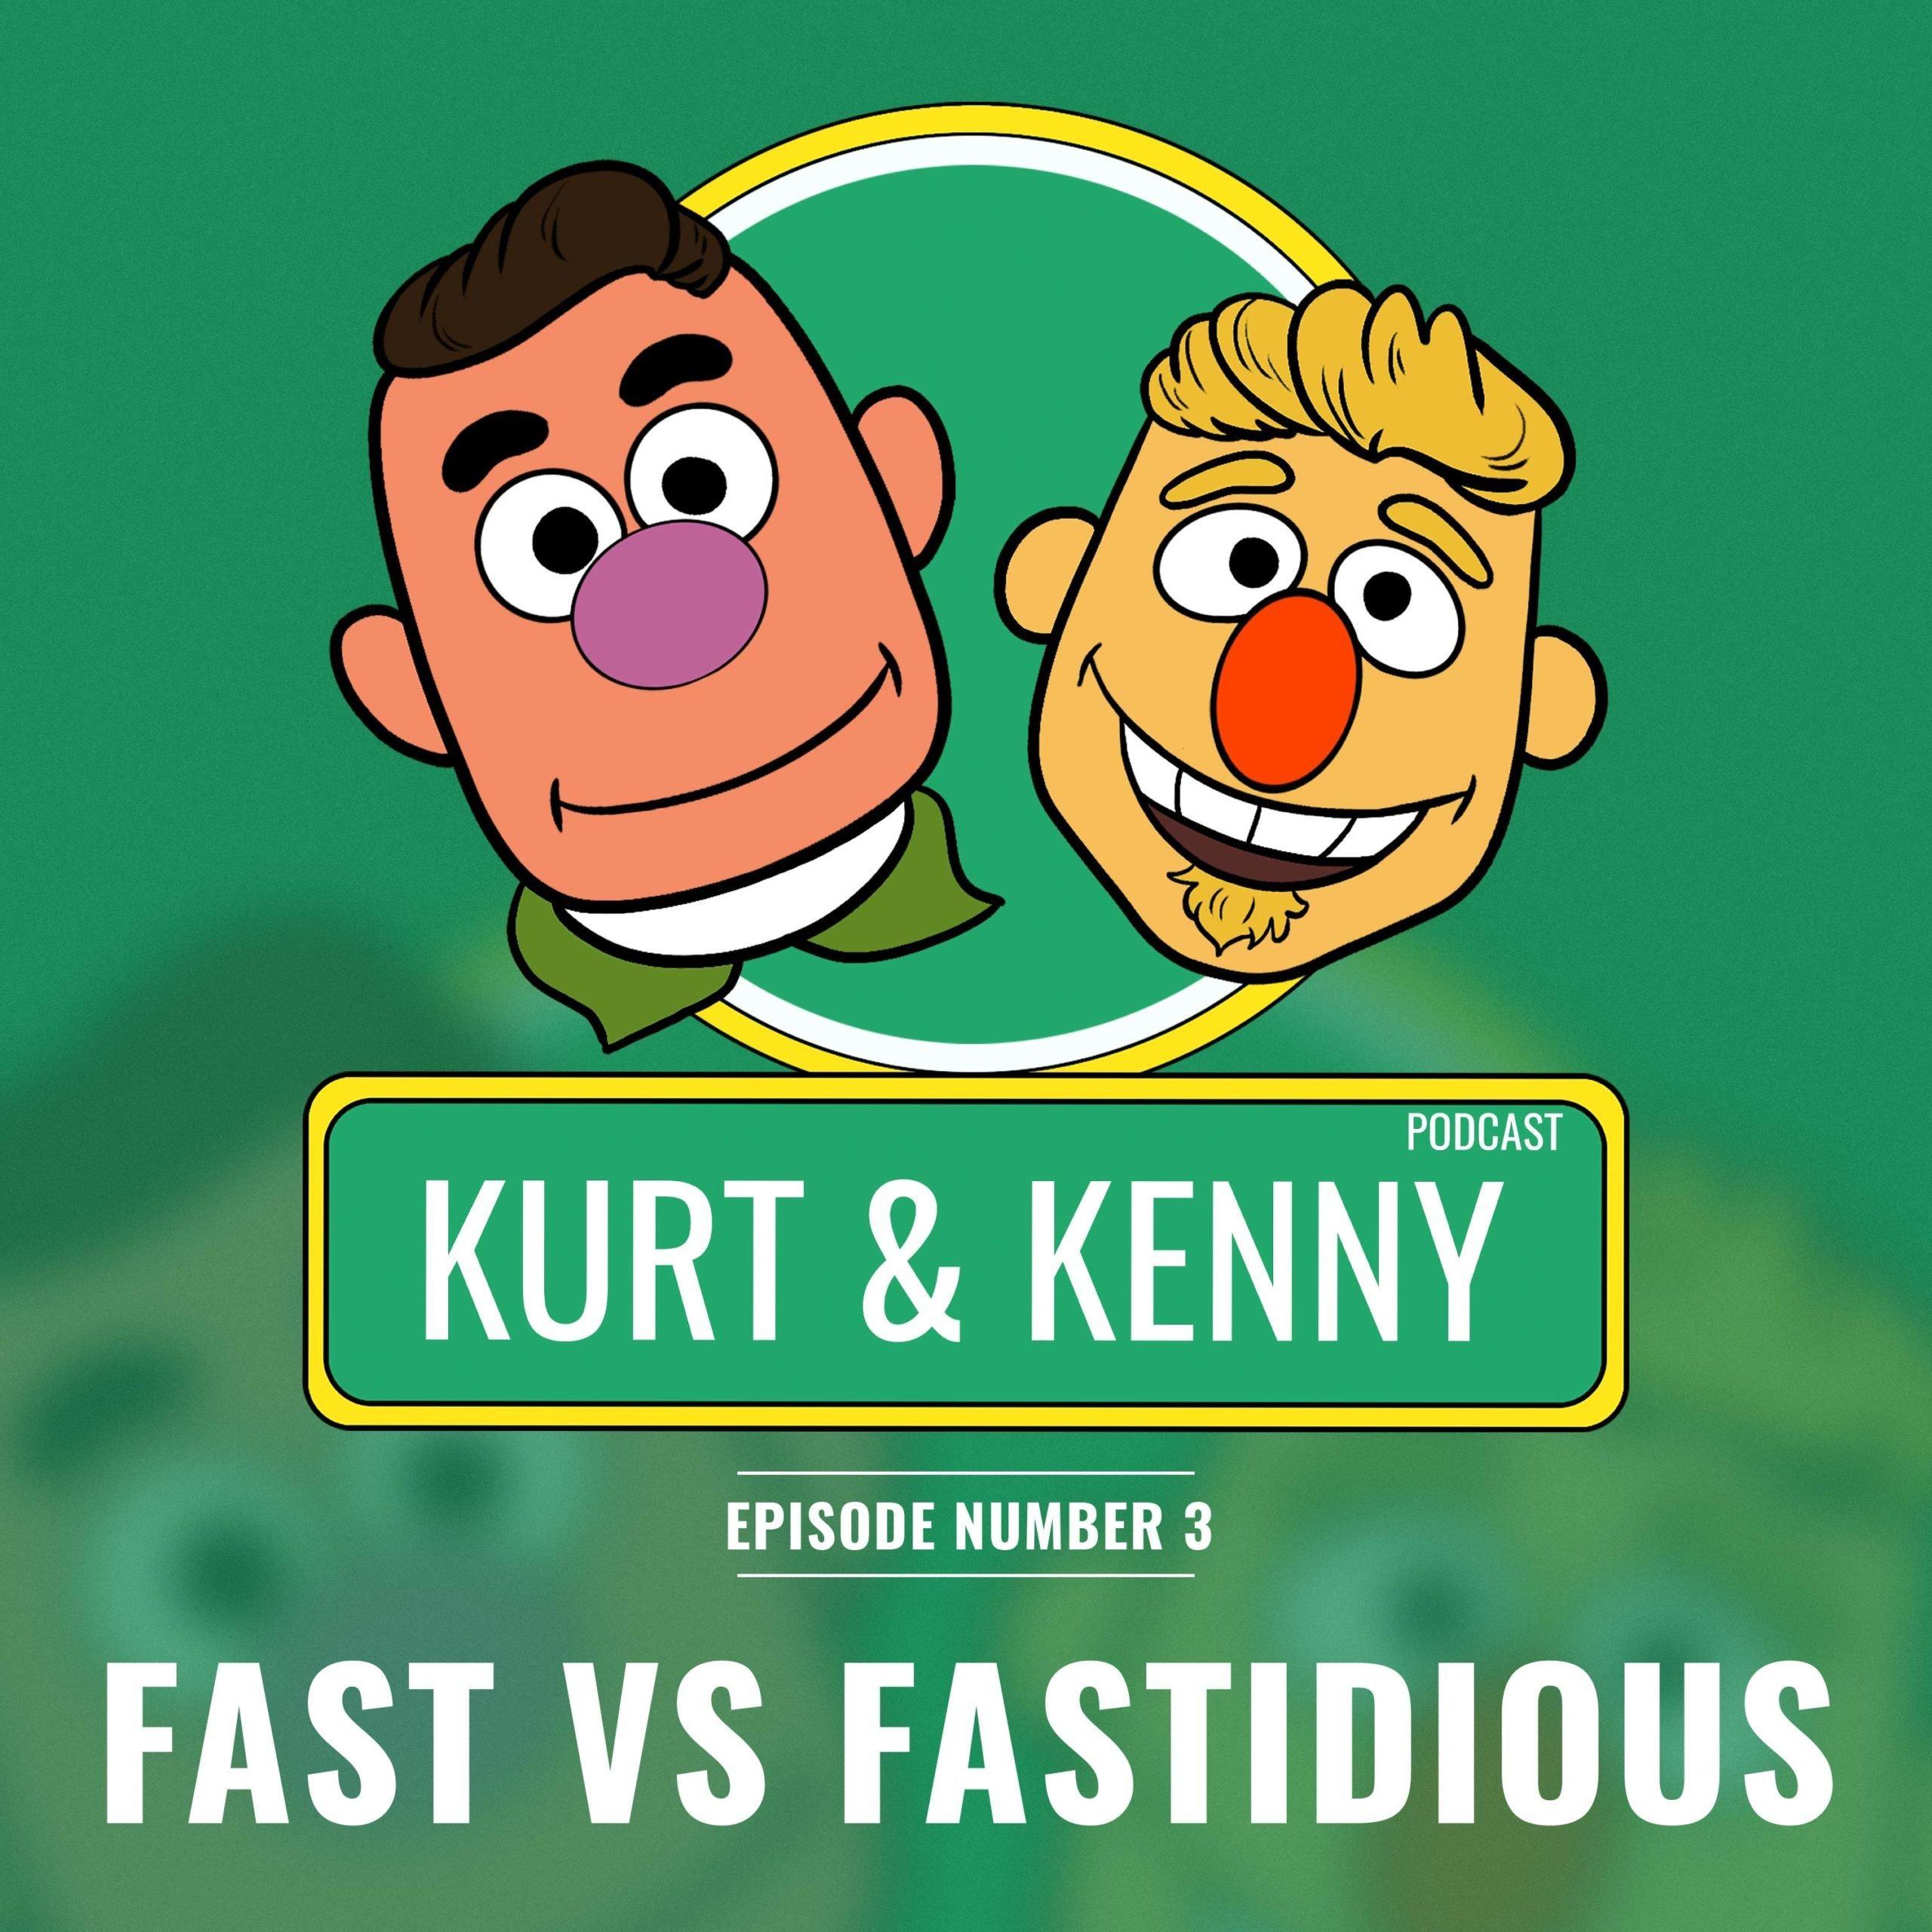 Fast vs Fastidious